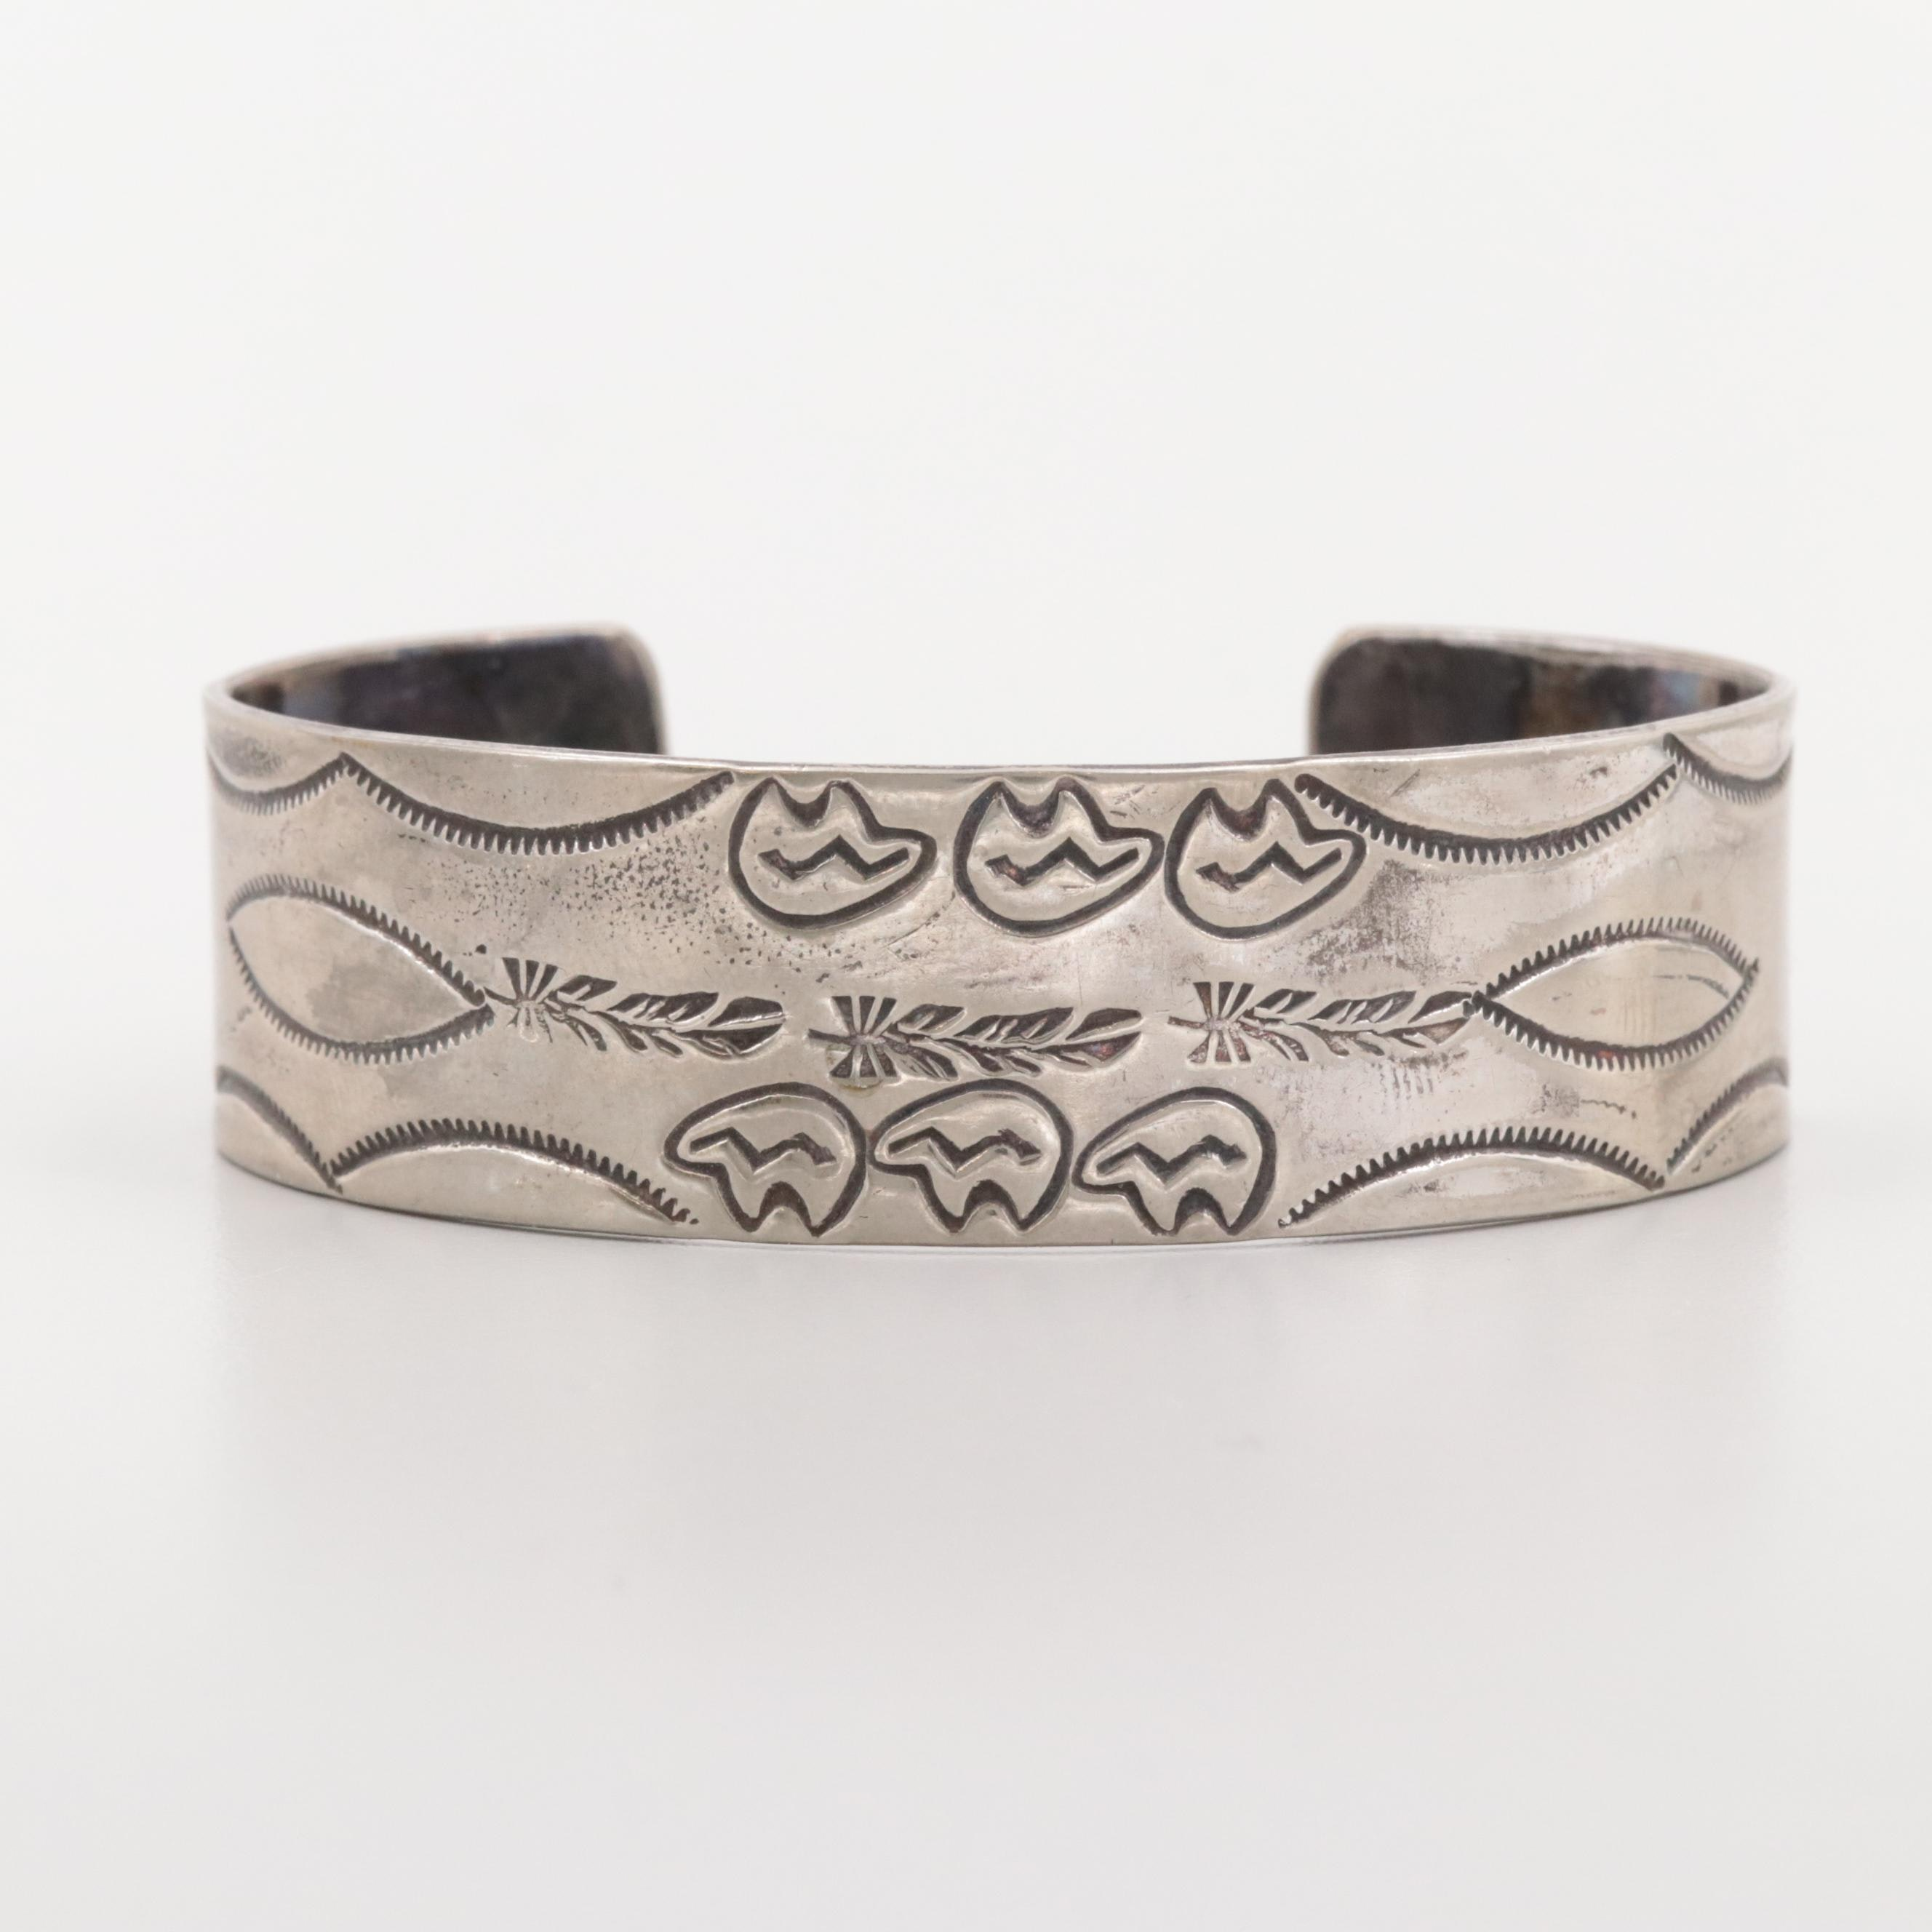 Southwestern Style Silver Tone Cuff Bracelet